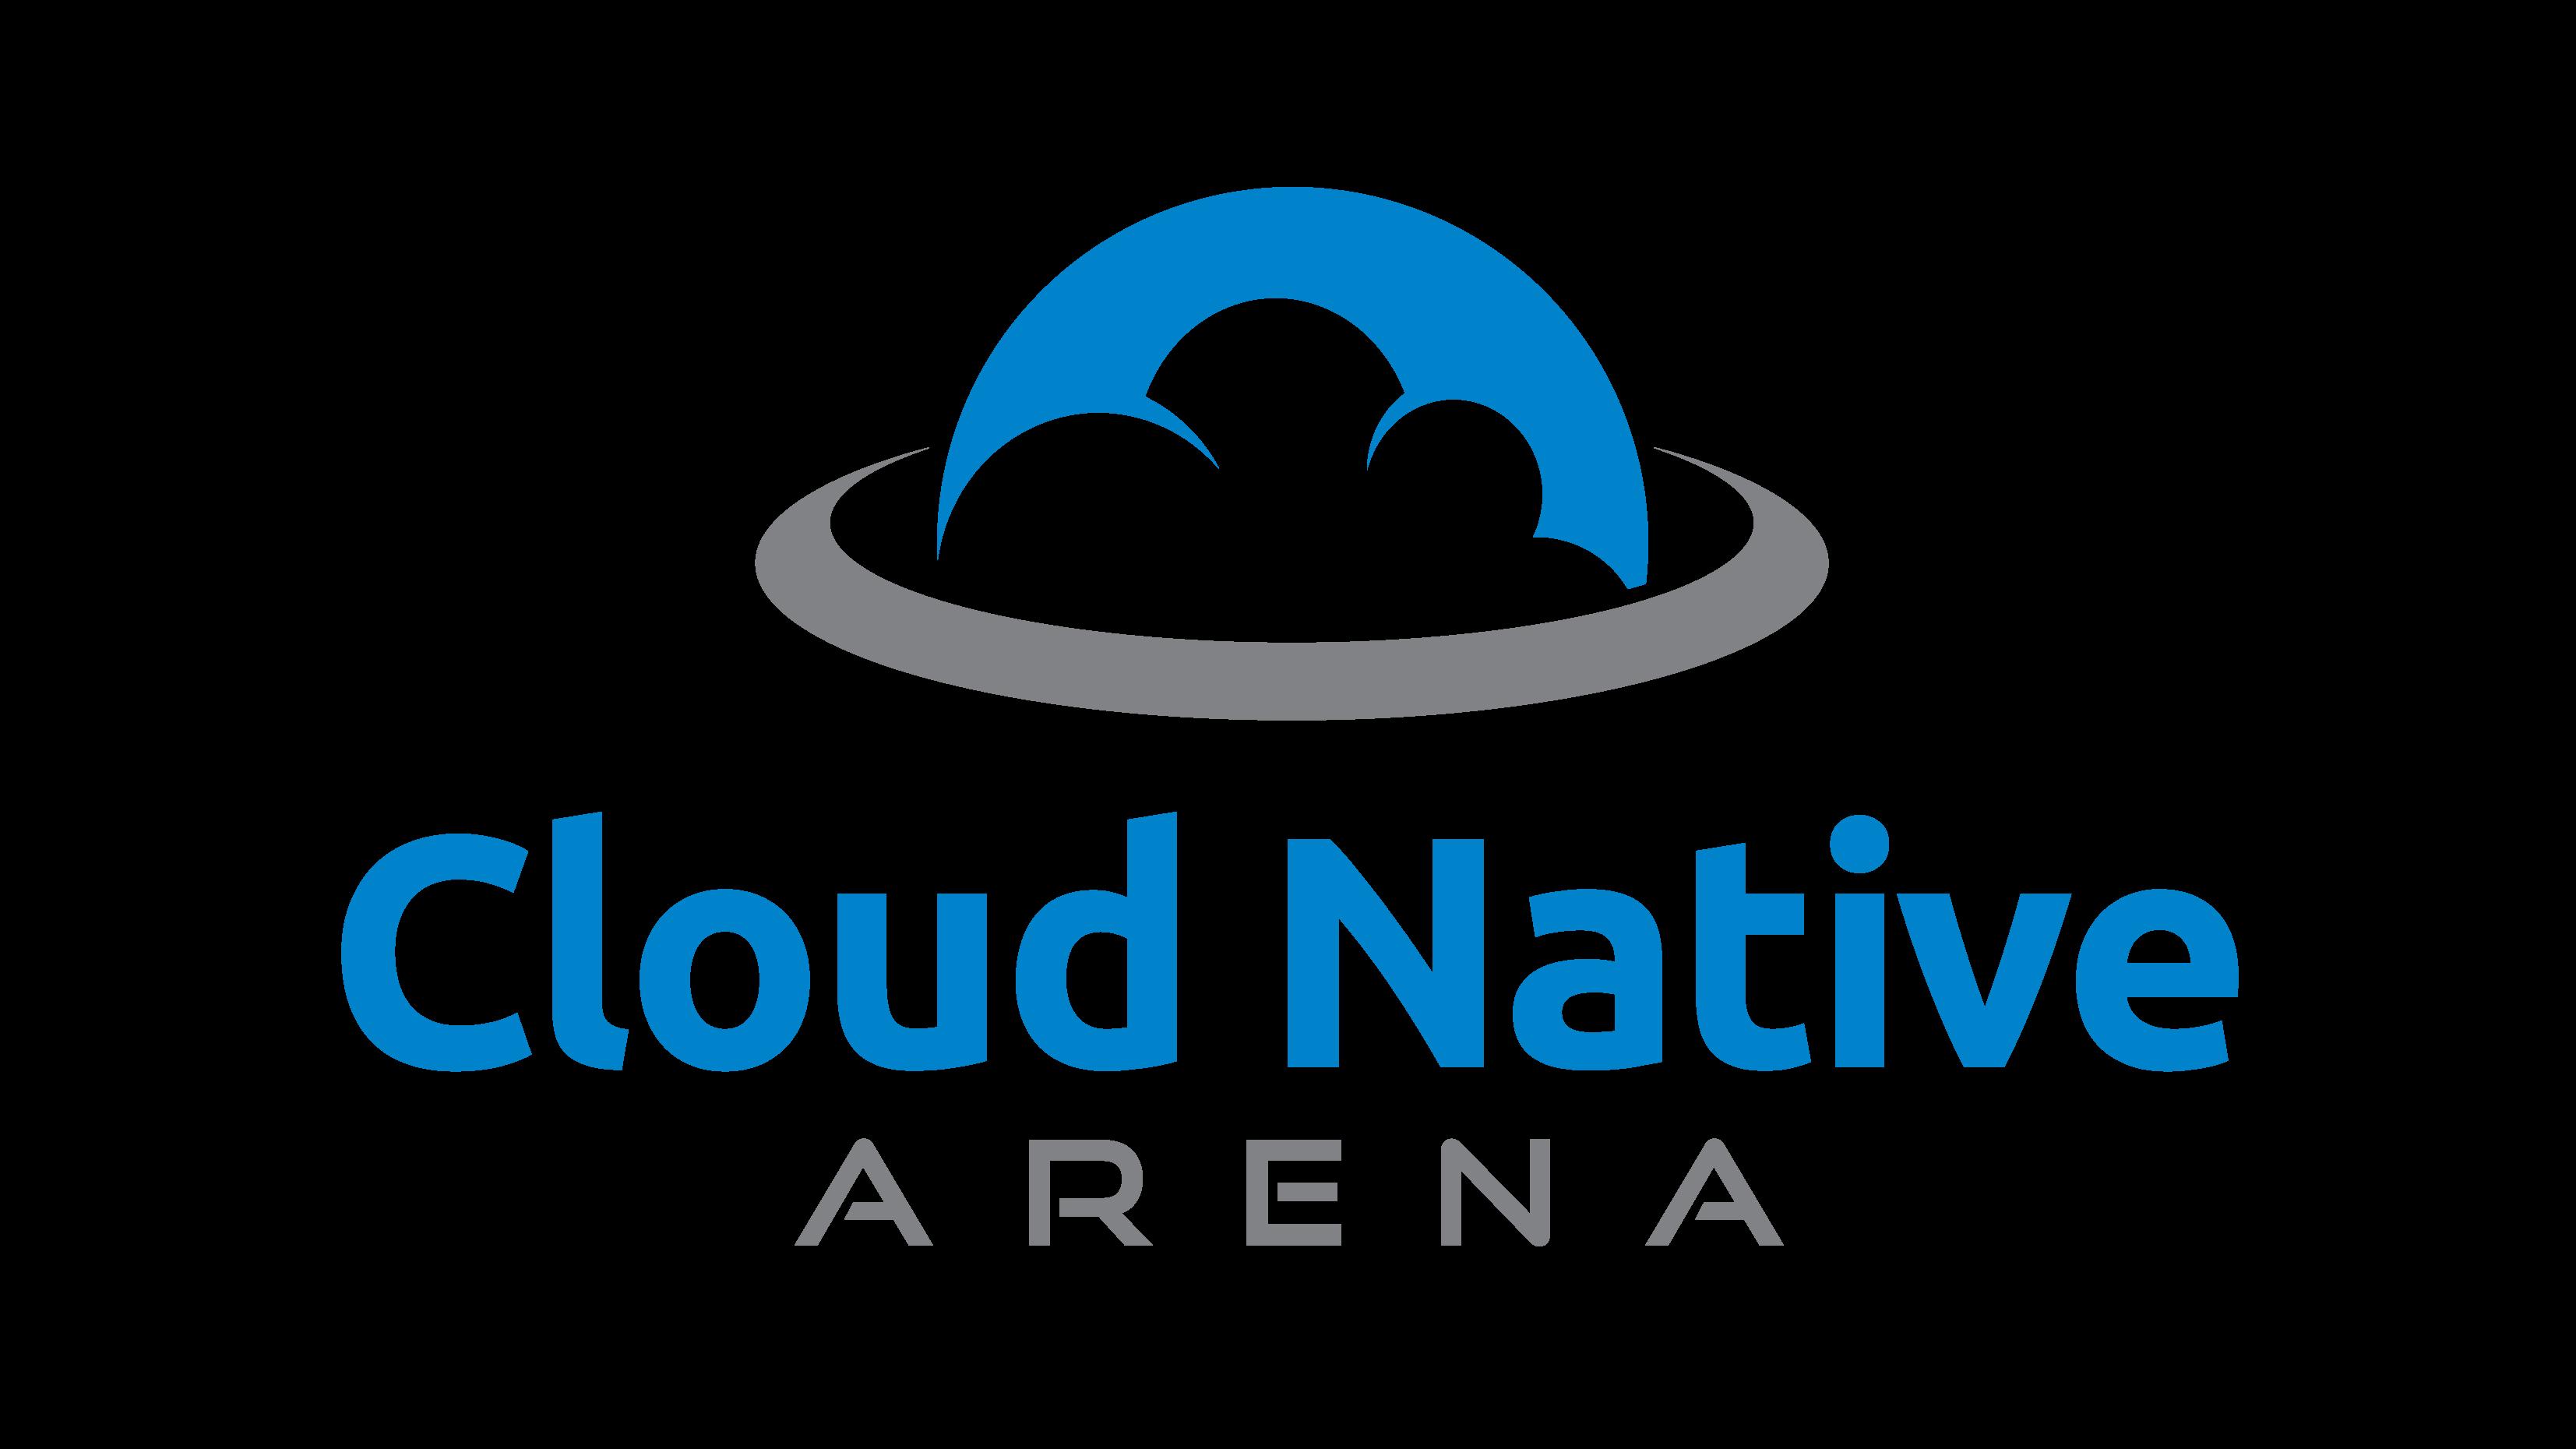 CloudNative Arena